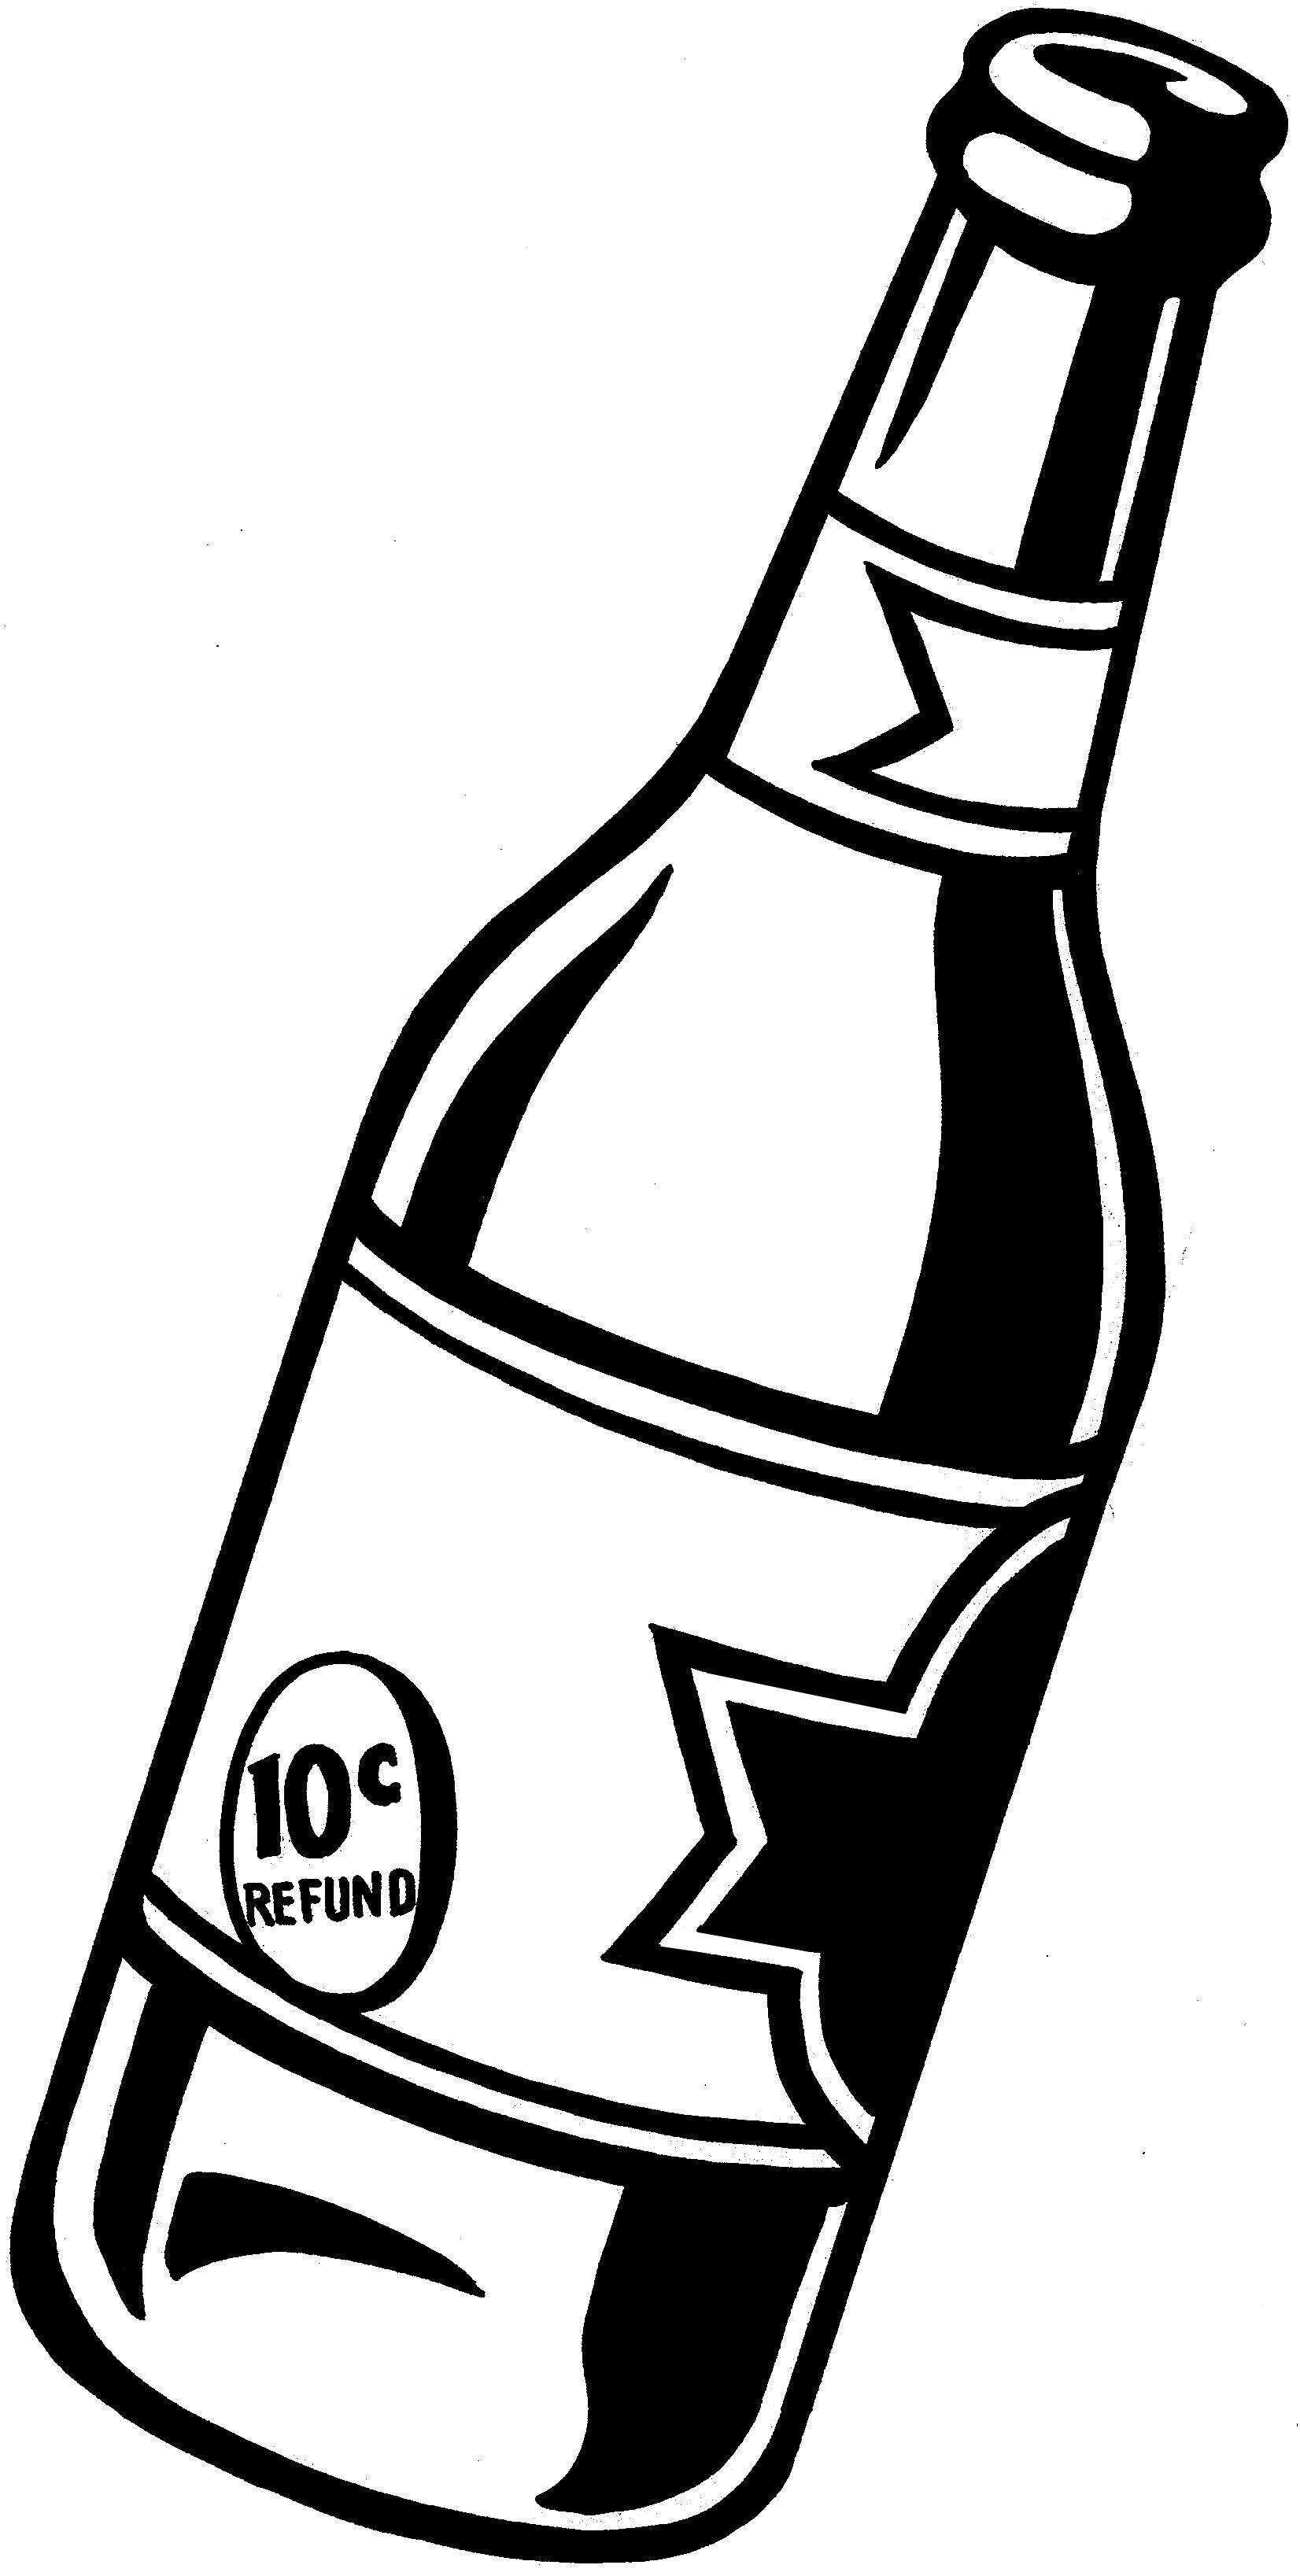 Free Beer Bottle, Download Free Clip Art, Free Clip Art on